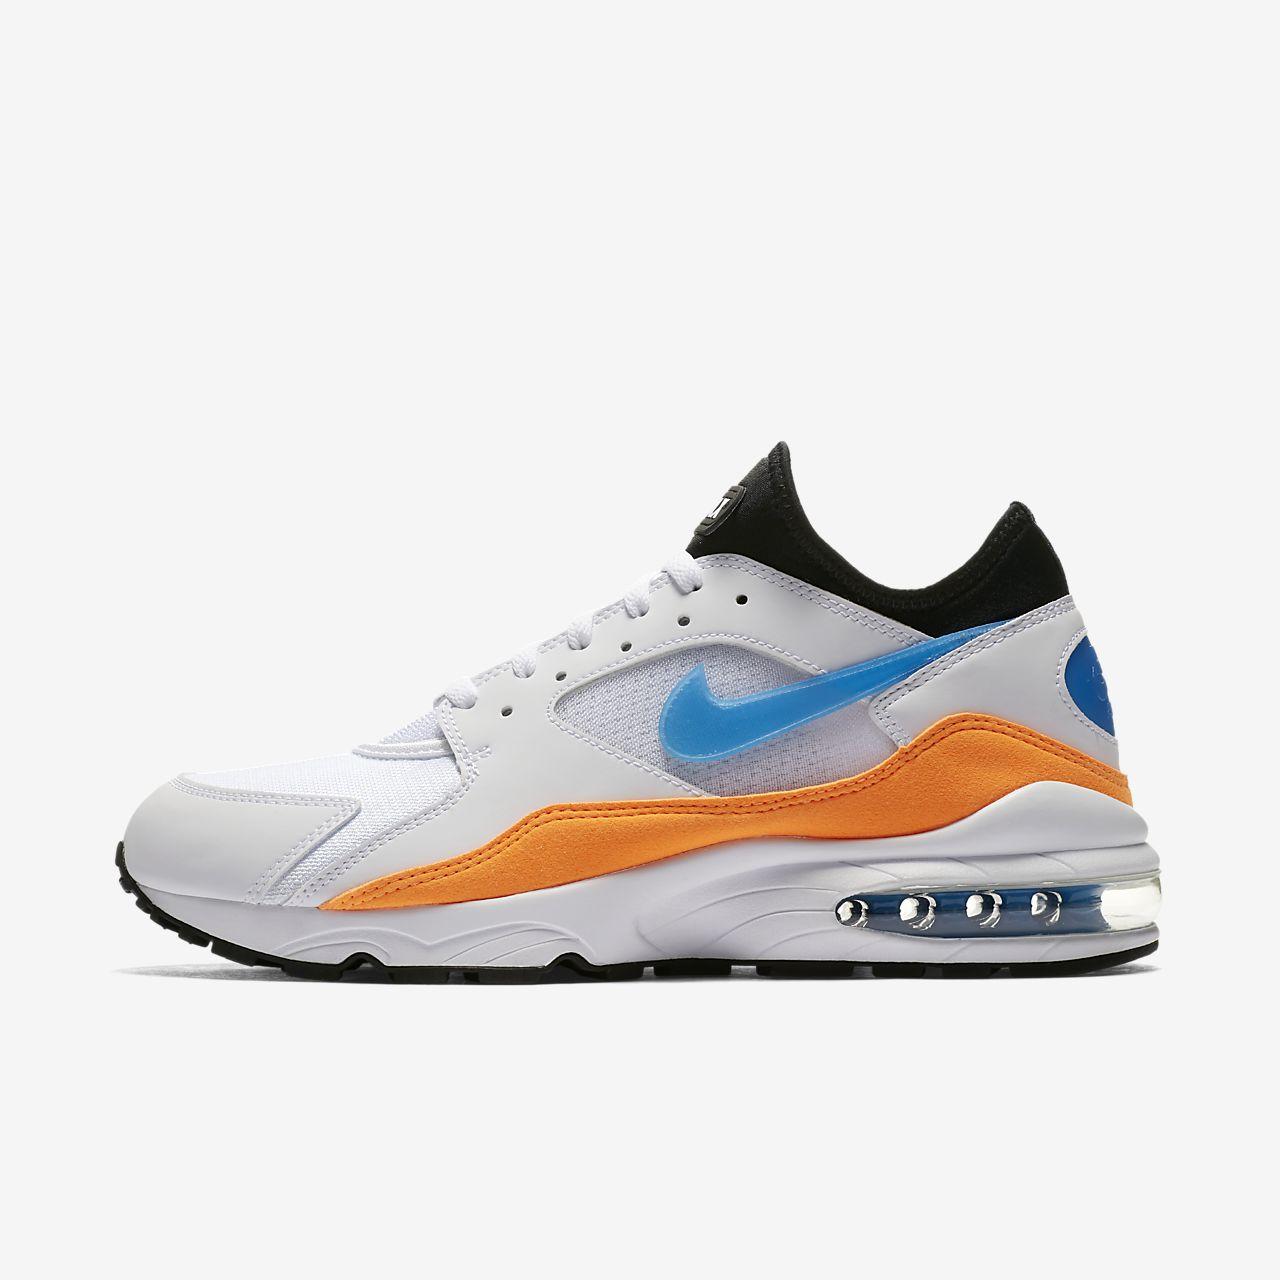 premium selection 24284 3874b ... Nike Air Max 93 – sko til mænd